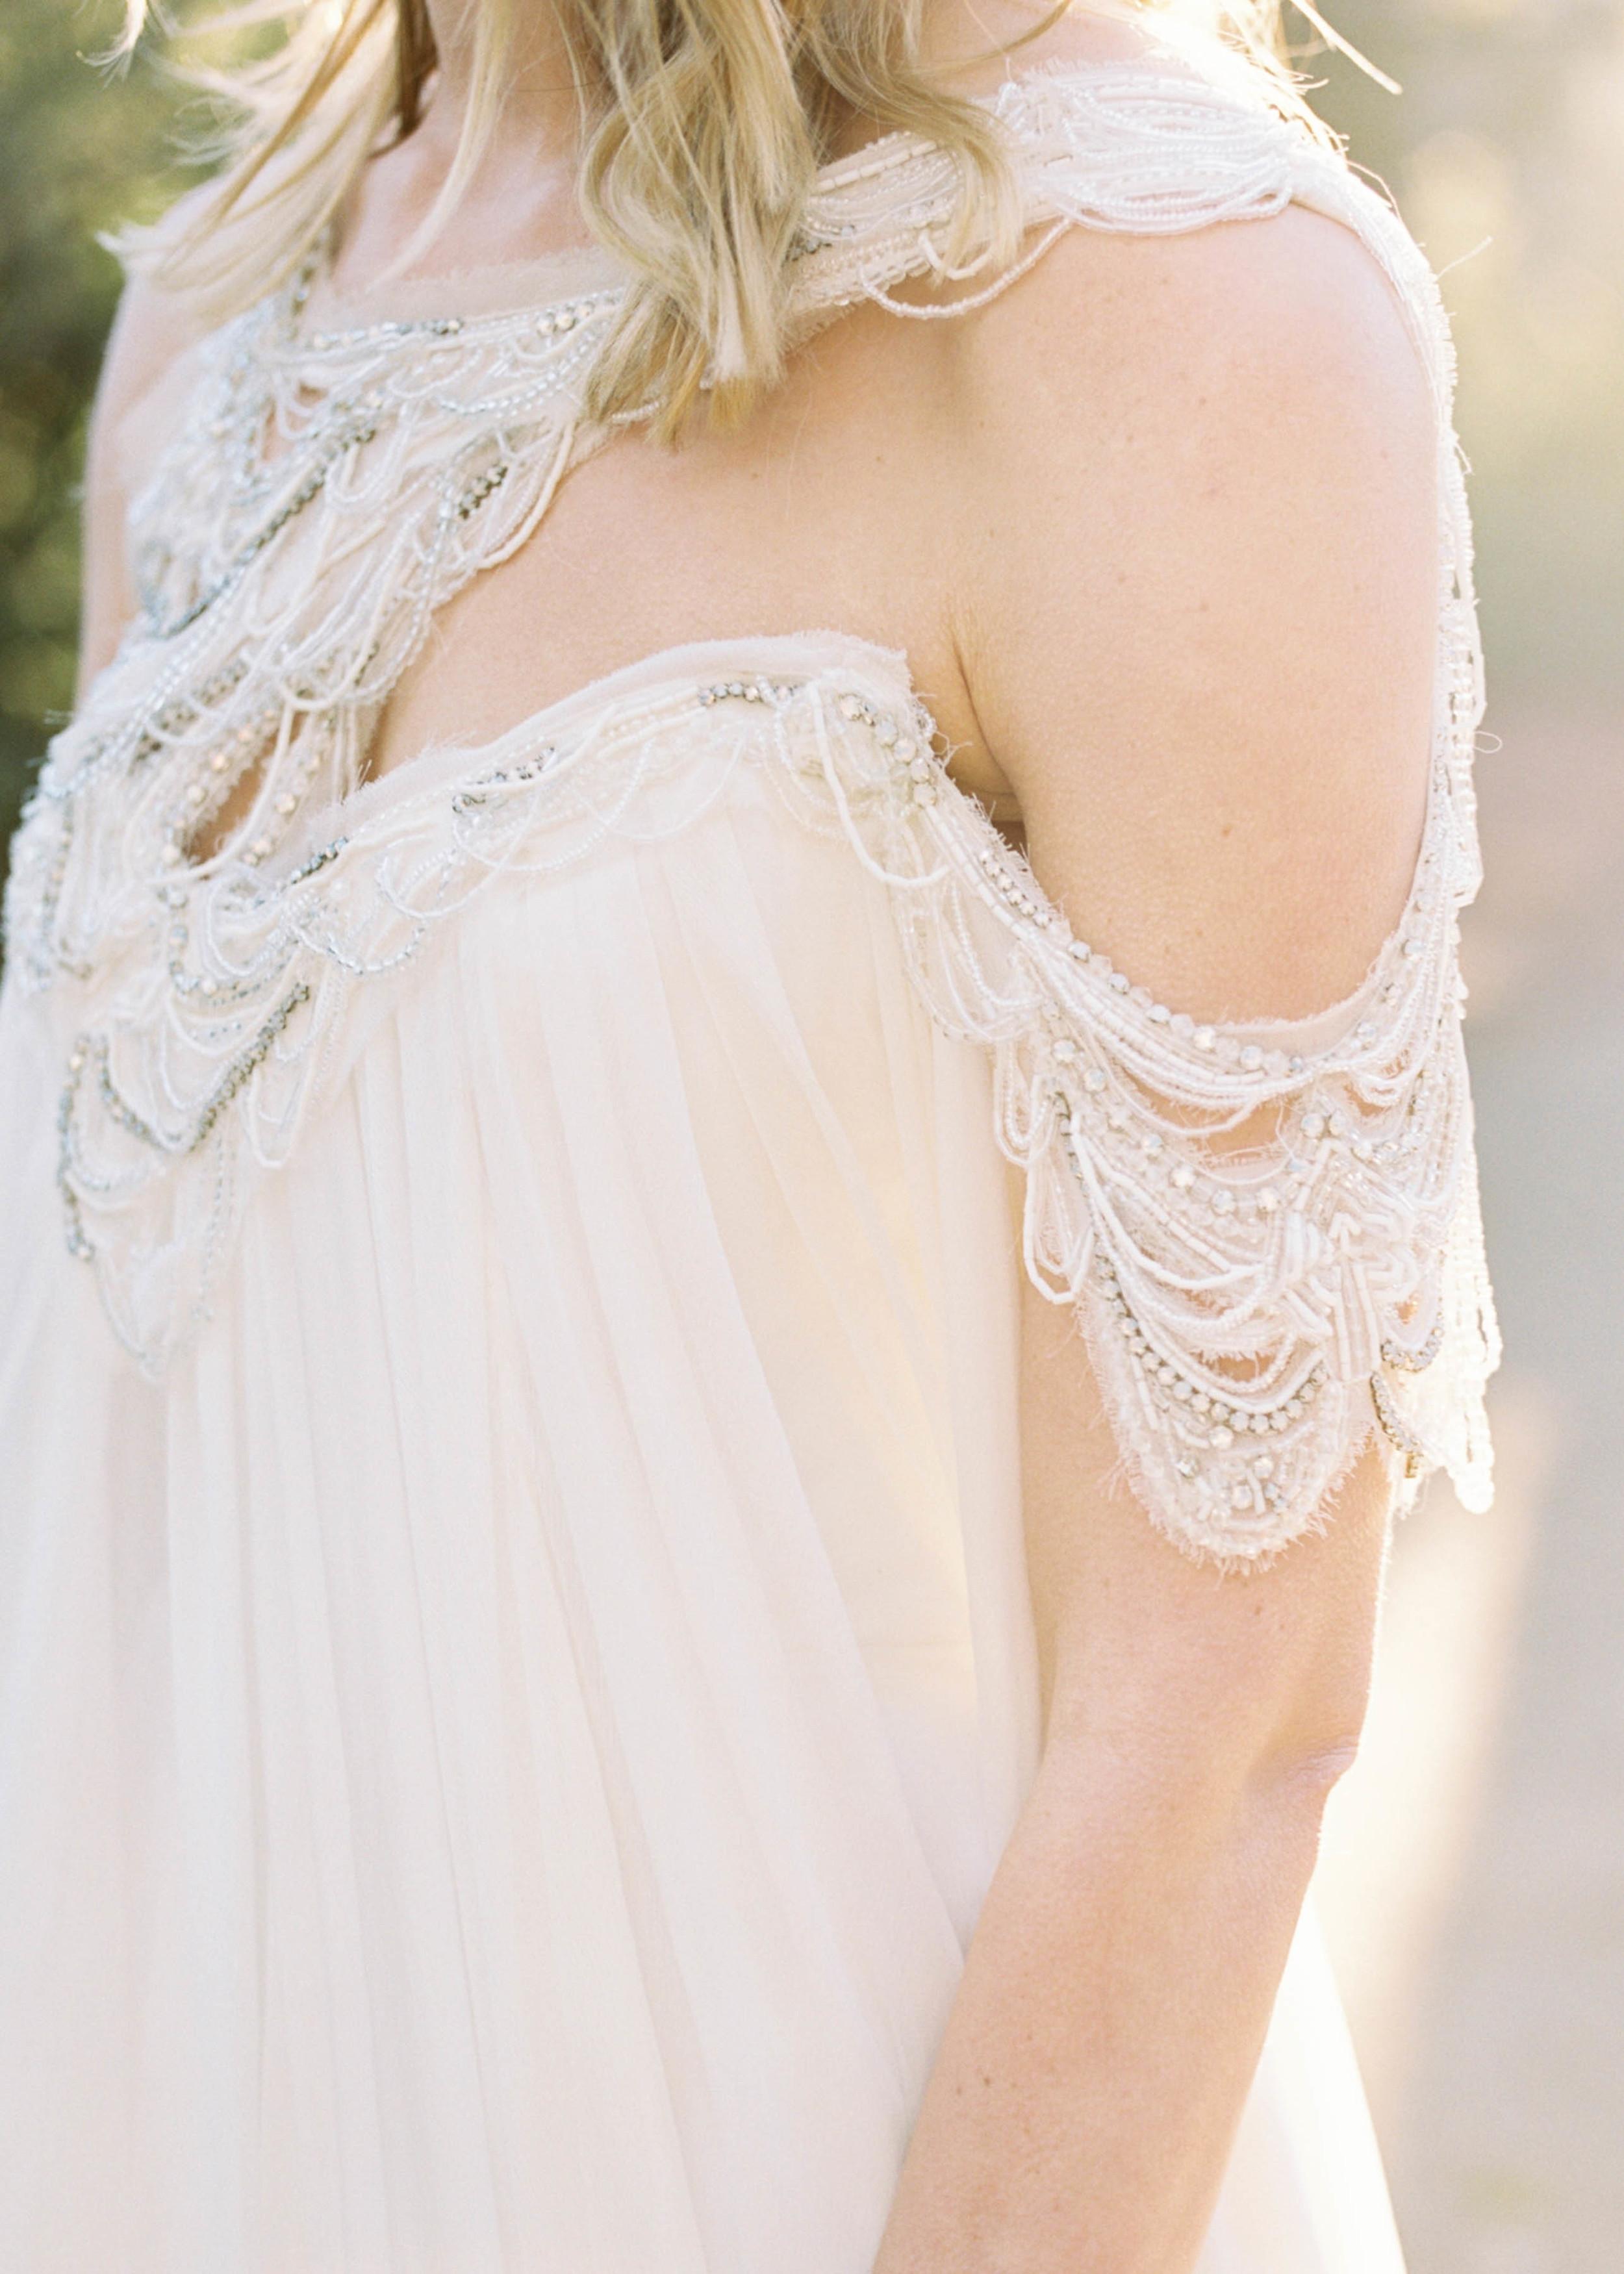 Danford-Photography-Bozeman-Montana-Arizona-Fine Art Film-Wedding-Engagement-Photographers-3.jpg